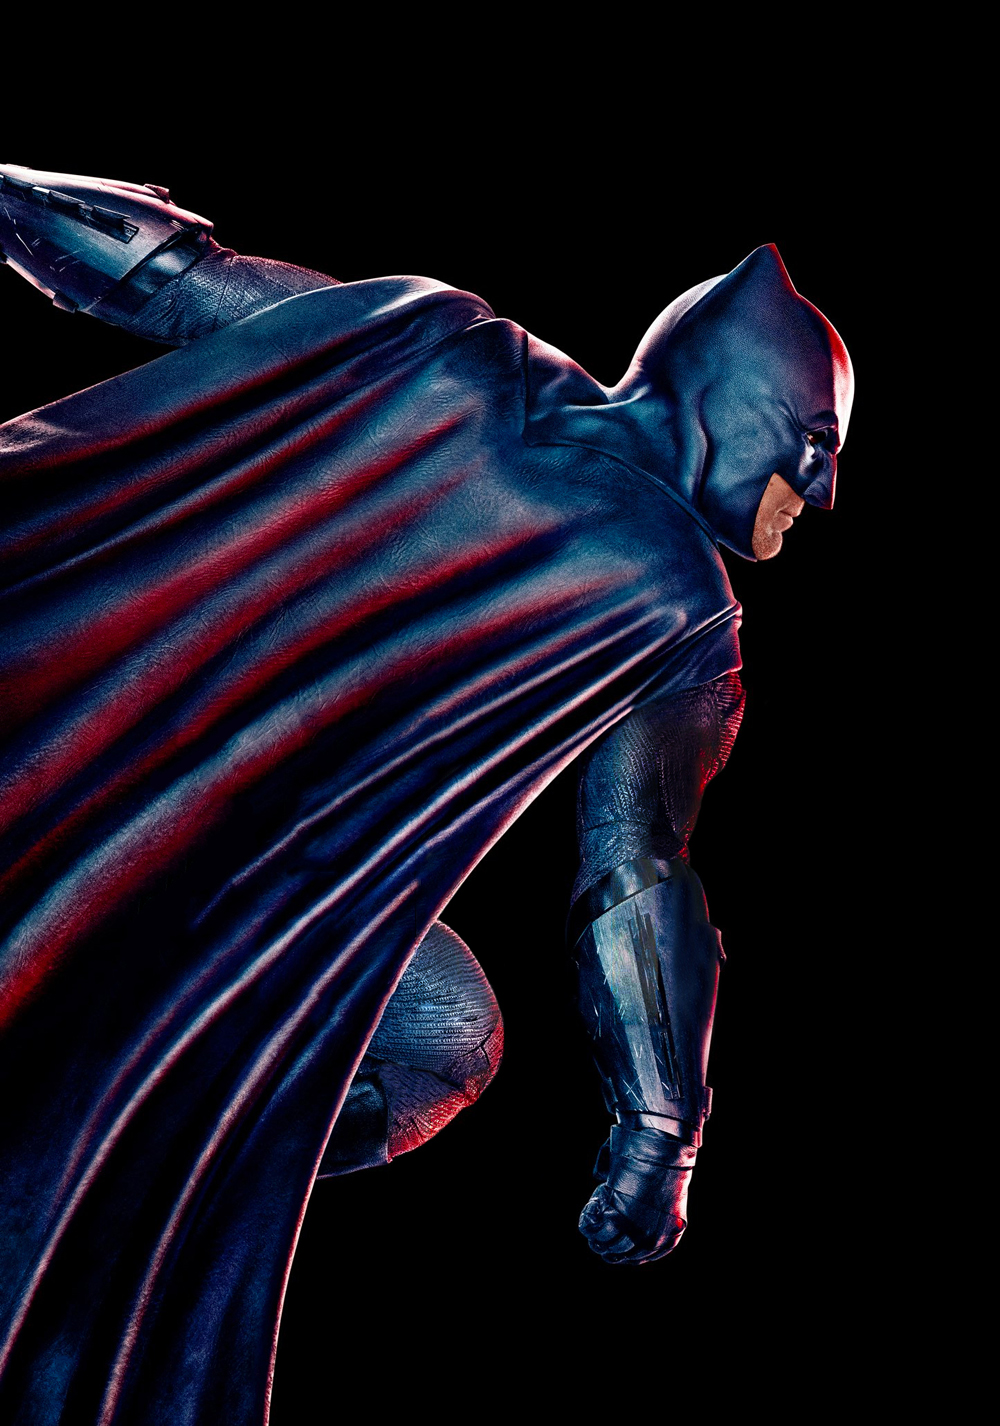 Batman (Ben Affleck) en Justice League (2017). Imagen: fanart.tv